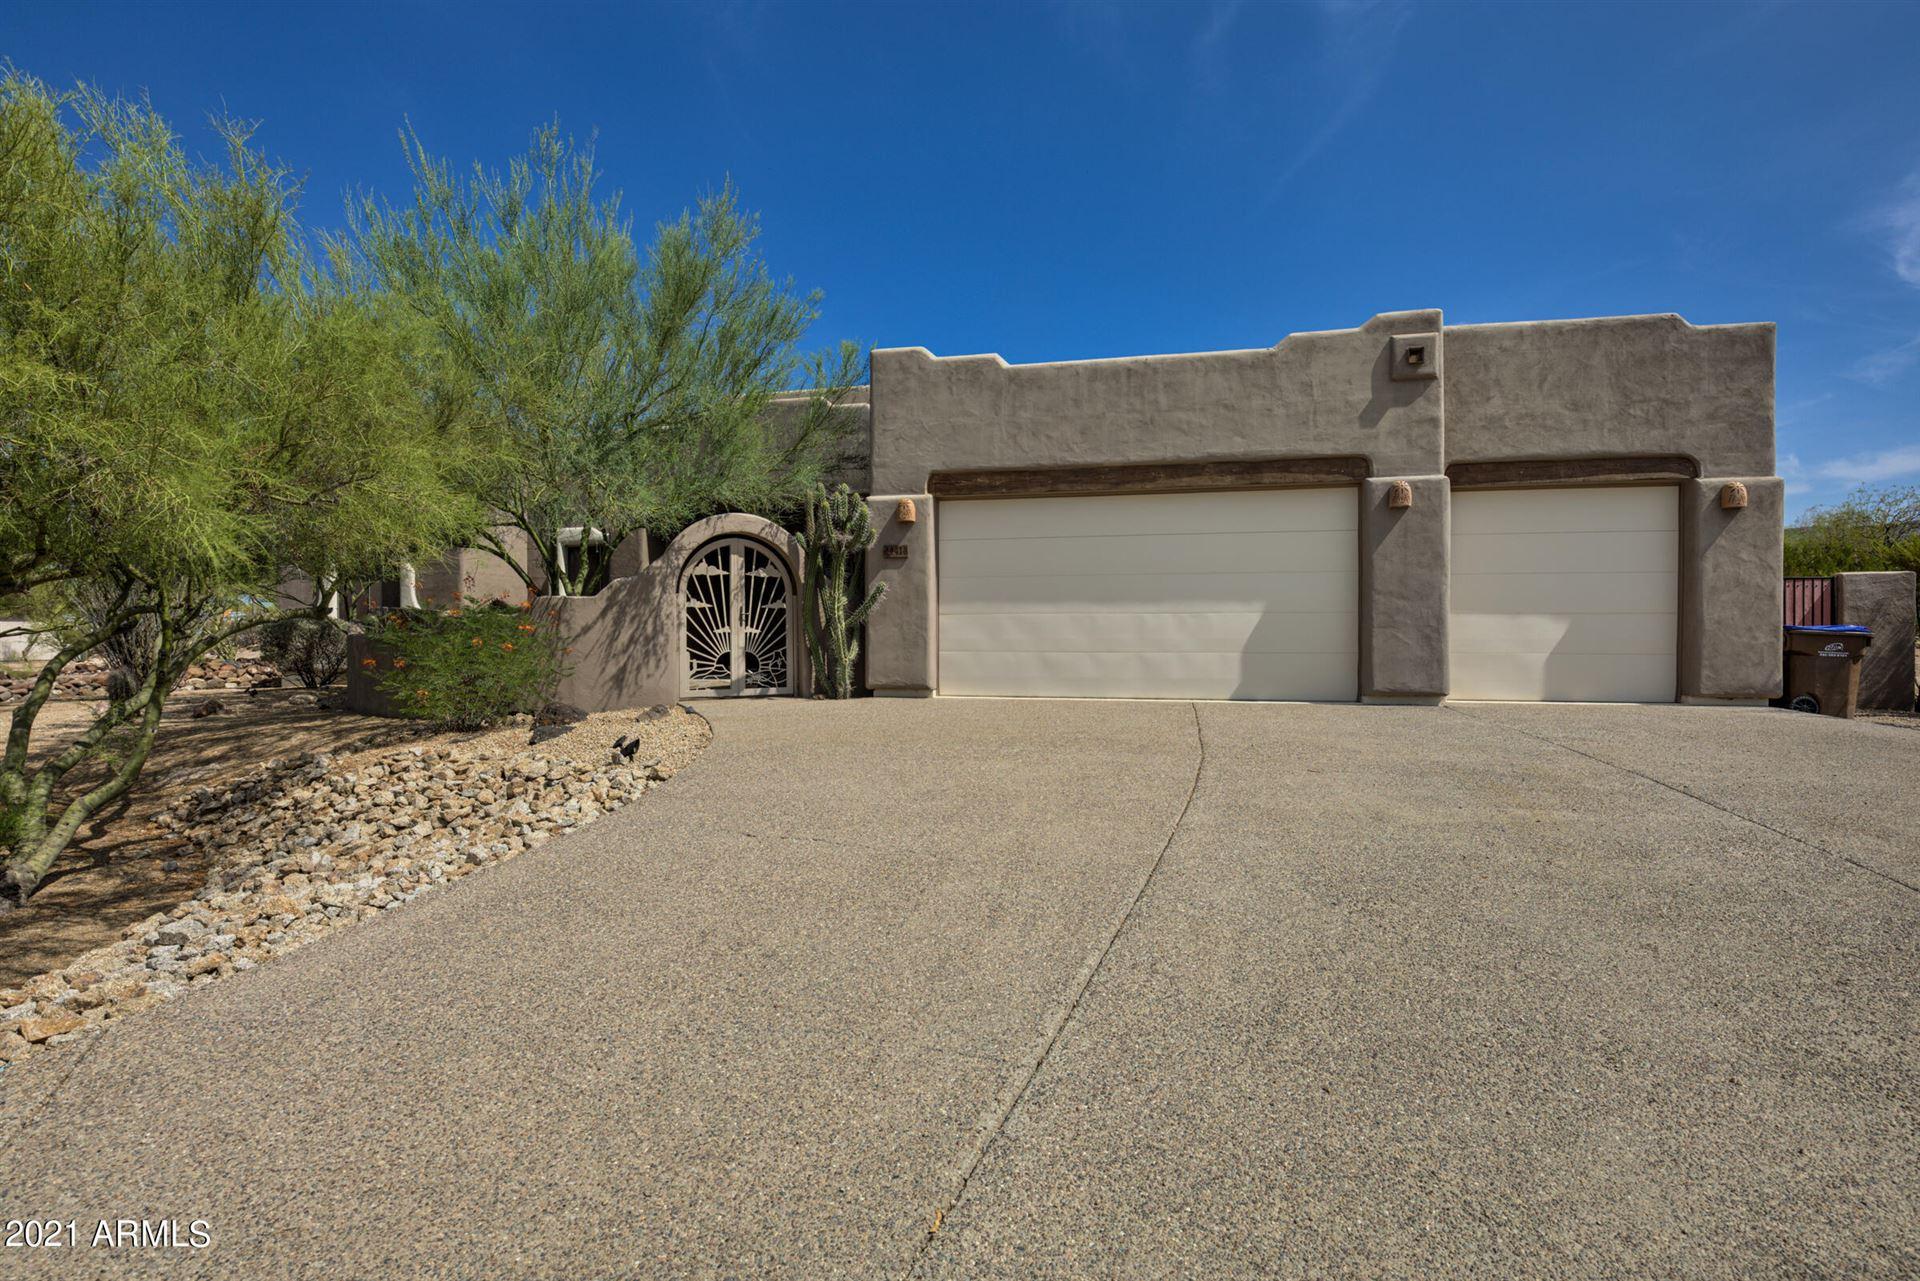 Photo of 44418 N 18TH Street, New River, AZ 85087 (MLS # 6267608)